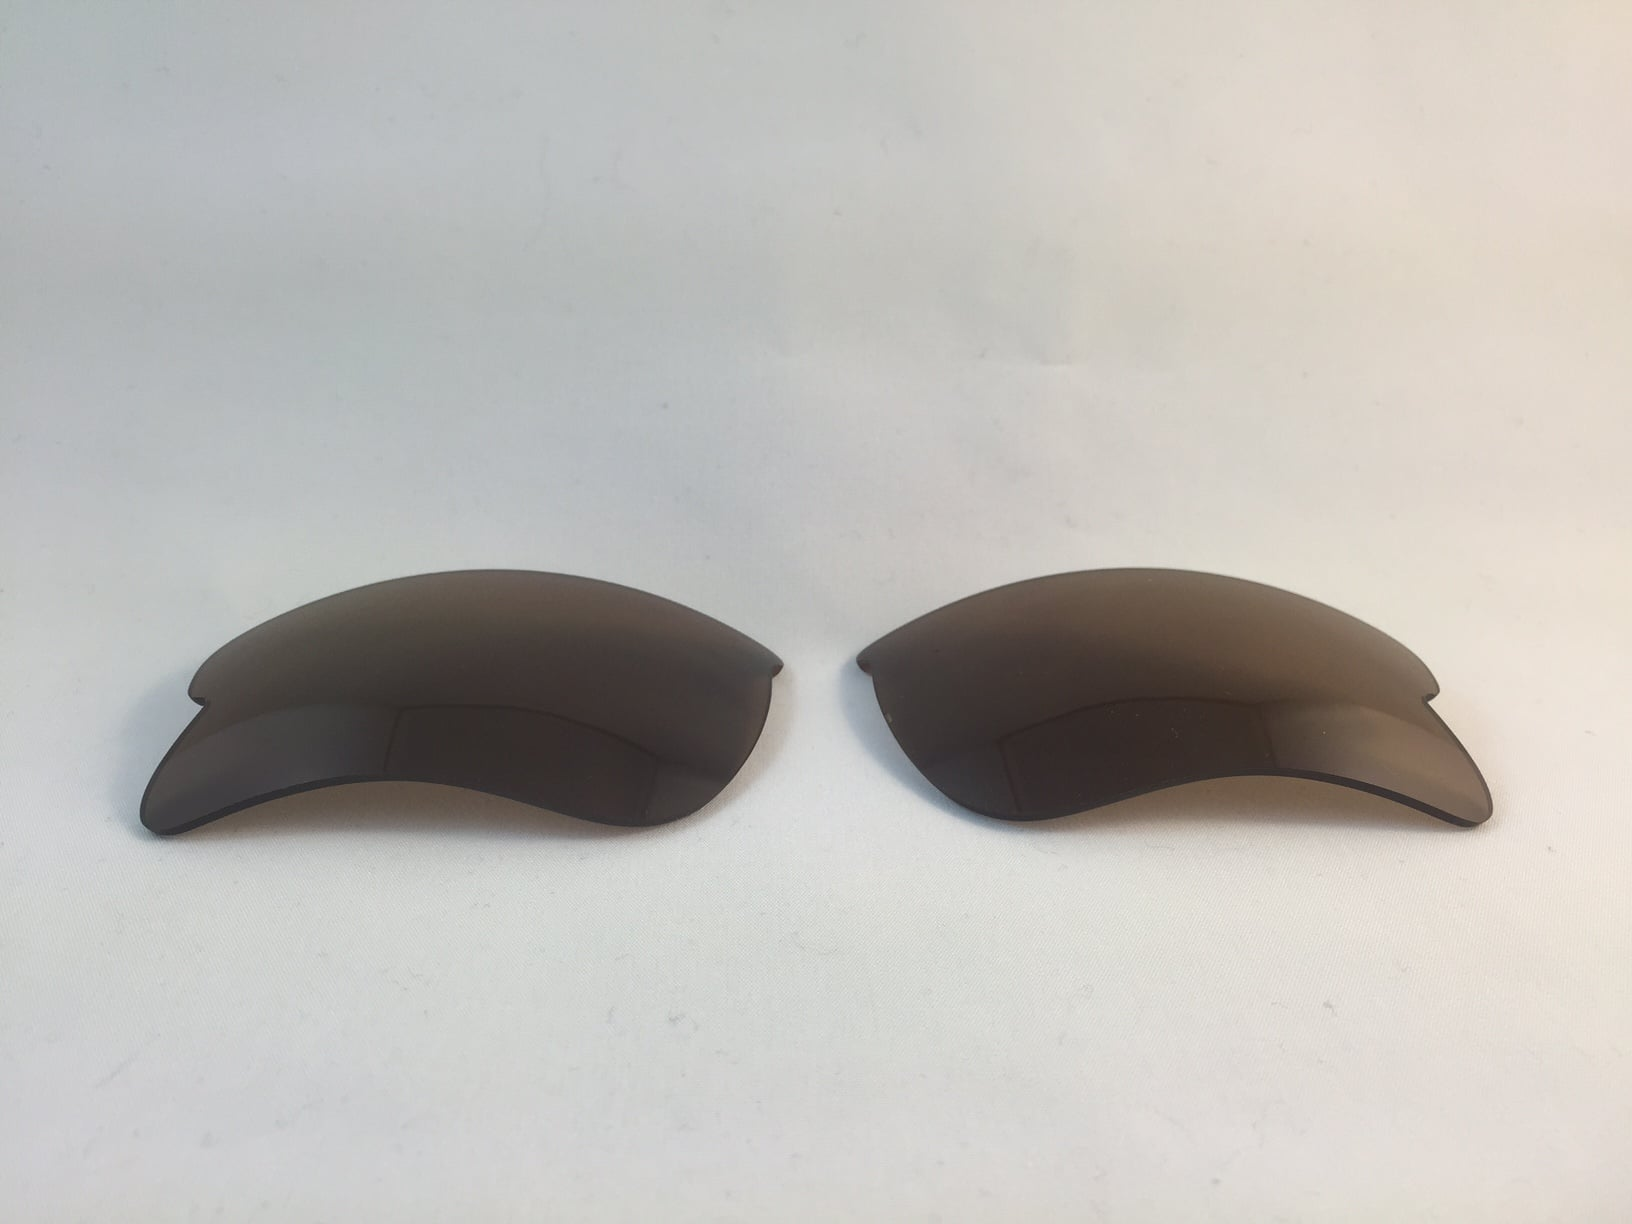 TRX Brown Polarized Lens Category 3 $25 plus tax